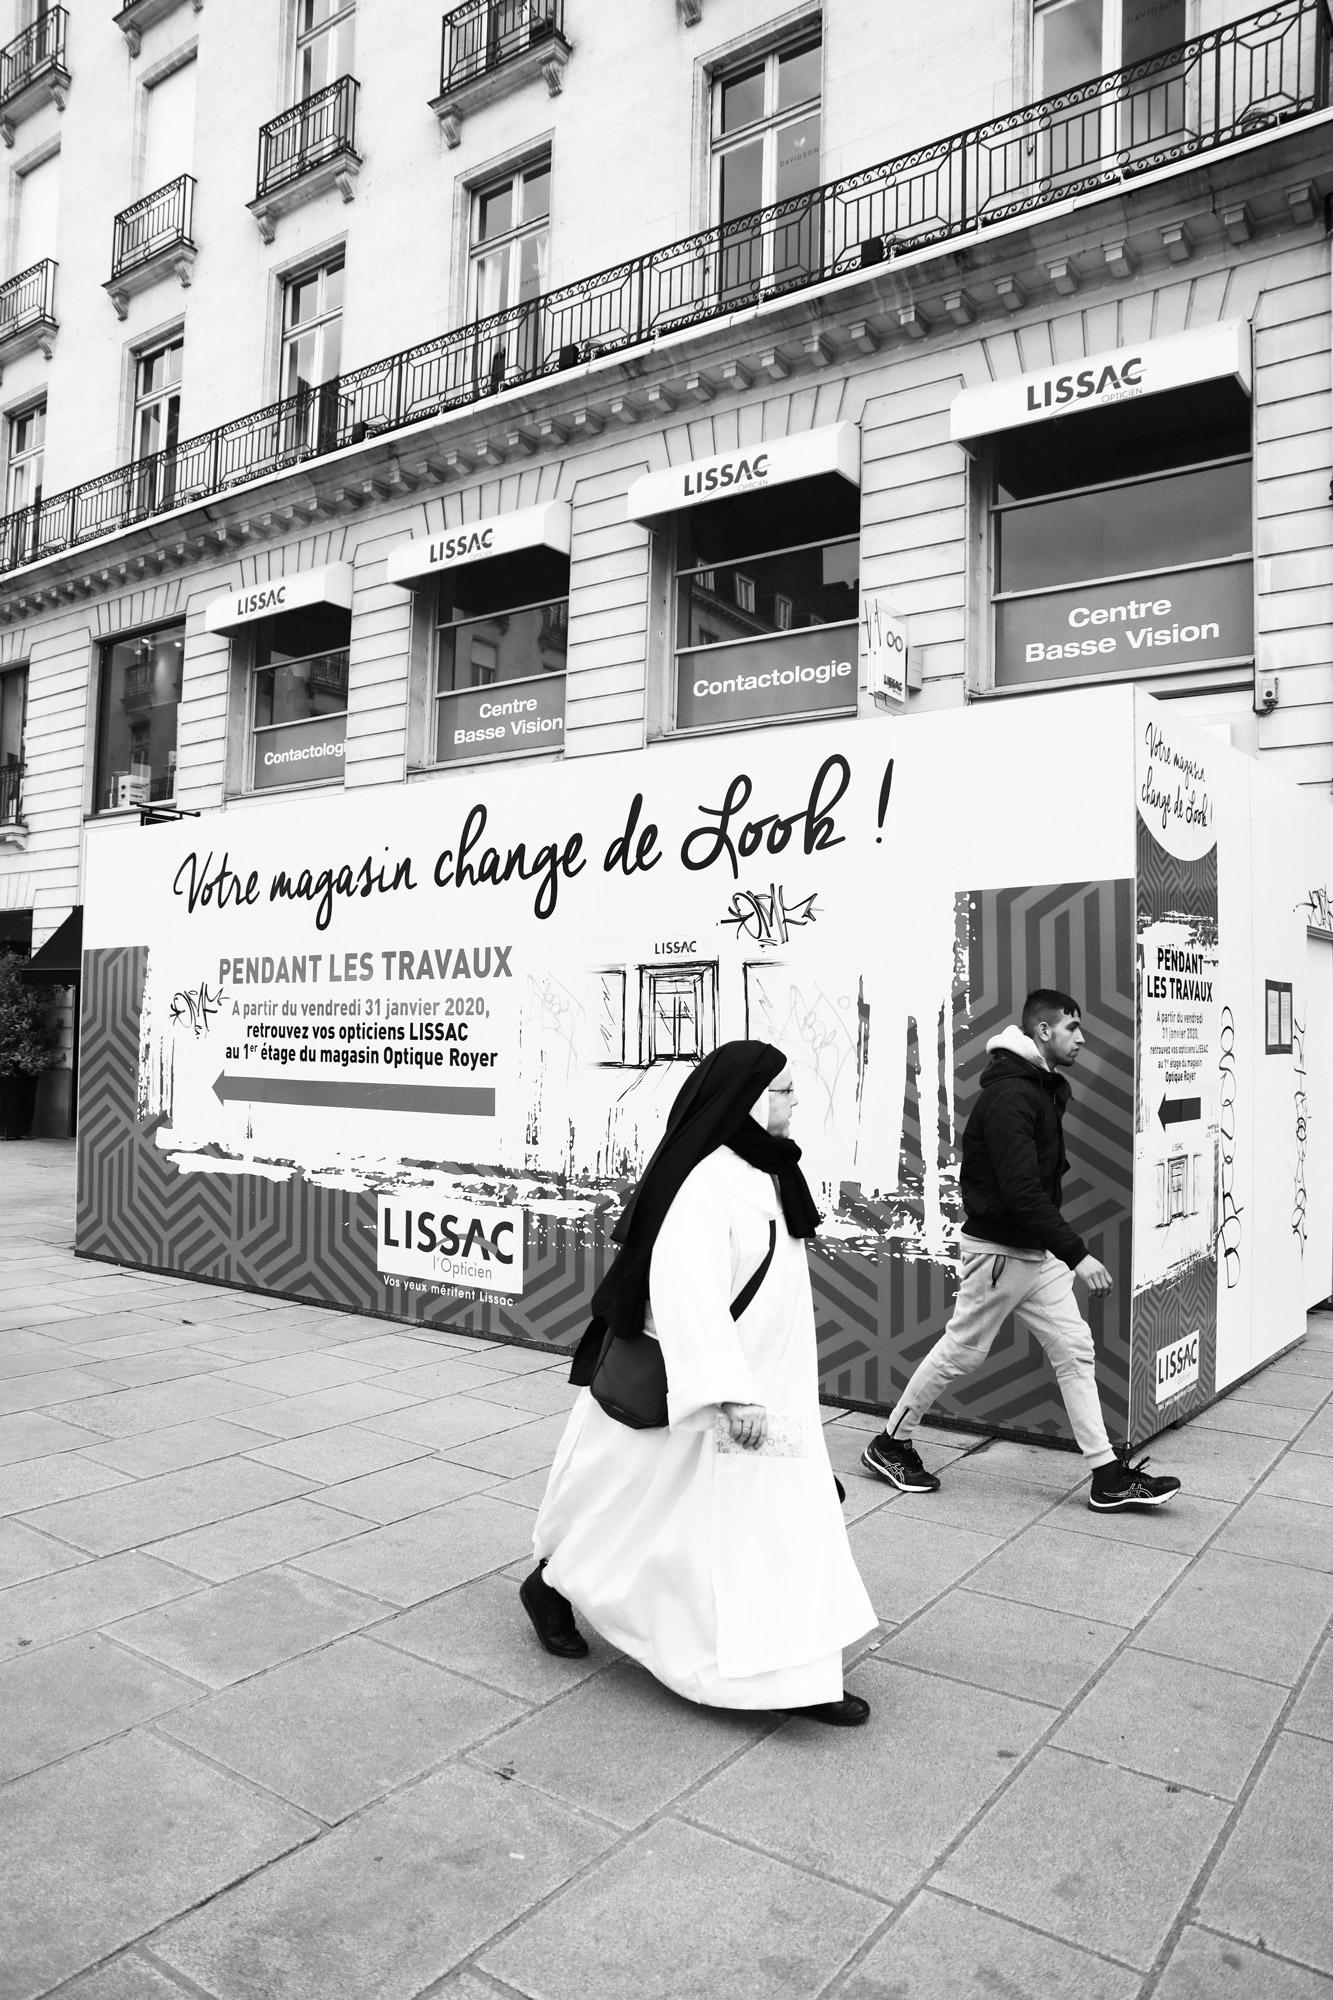 """Camouflage"" - Place Royale, Nantes. ©Clémence Rougetet"